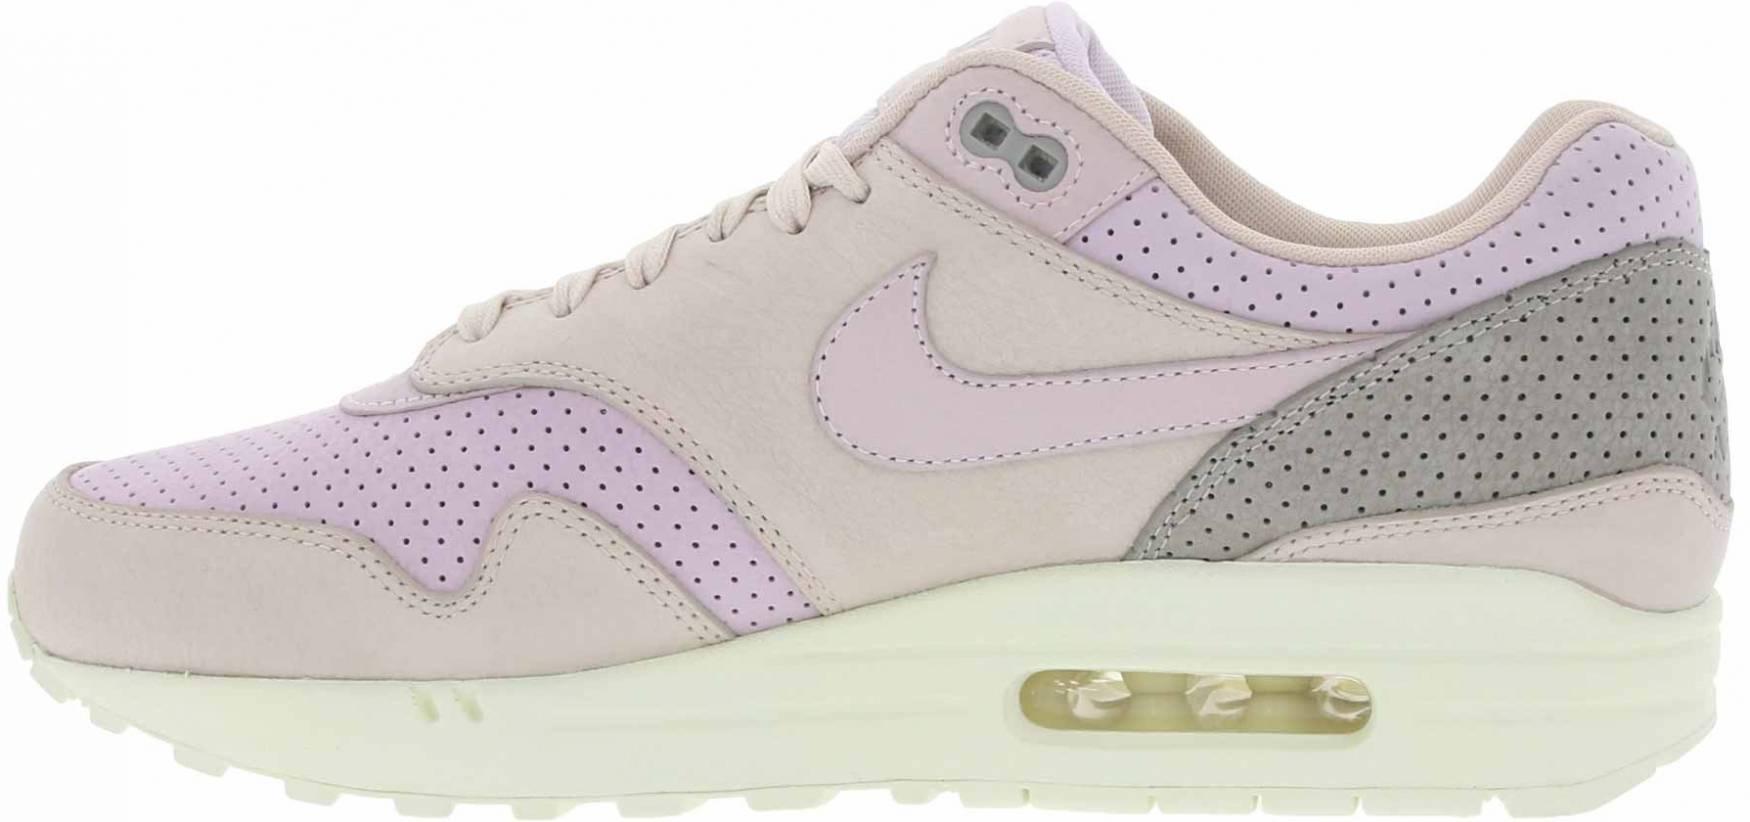 NikeLab Air Max 1 Pinnacle sneakers in pink | RunRepeat